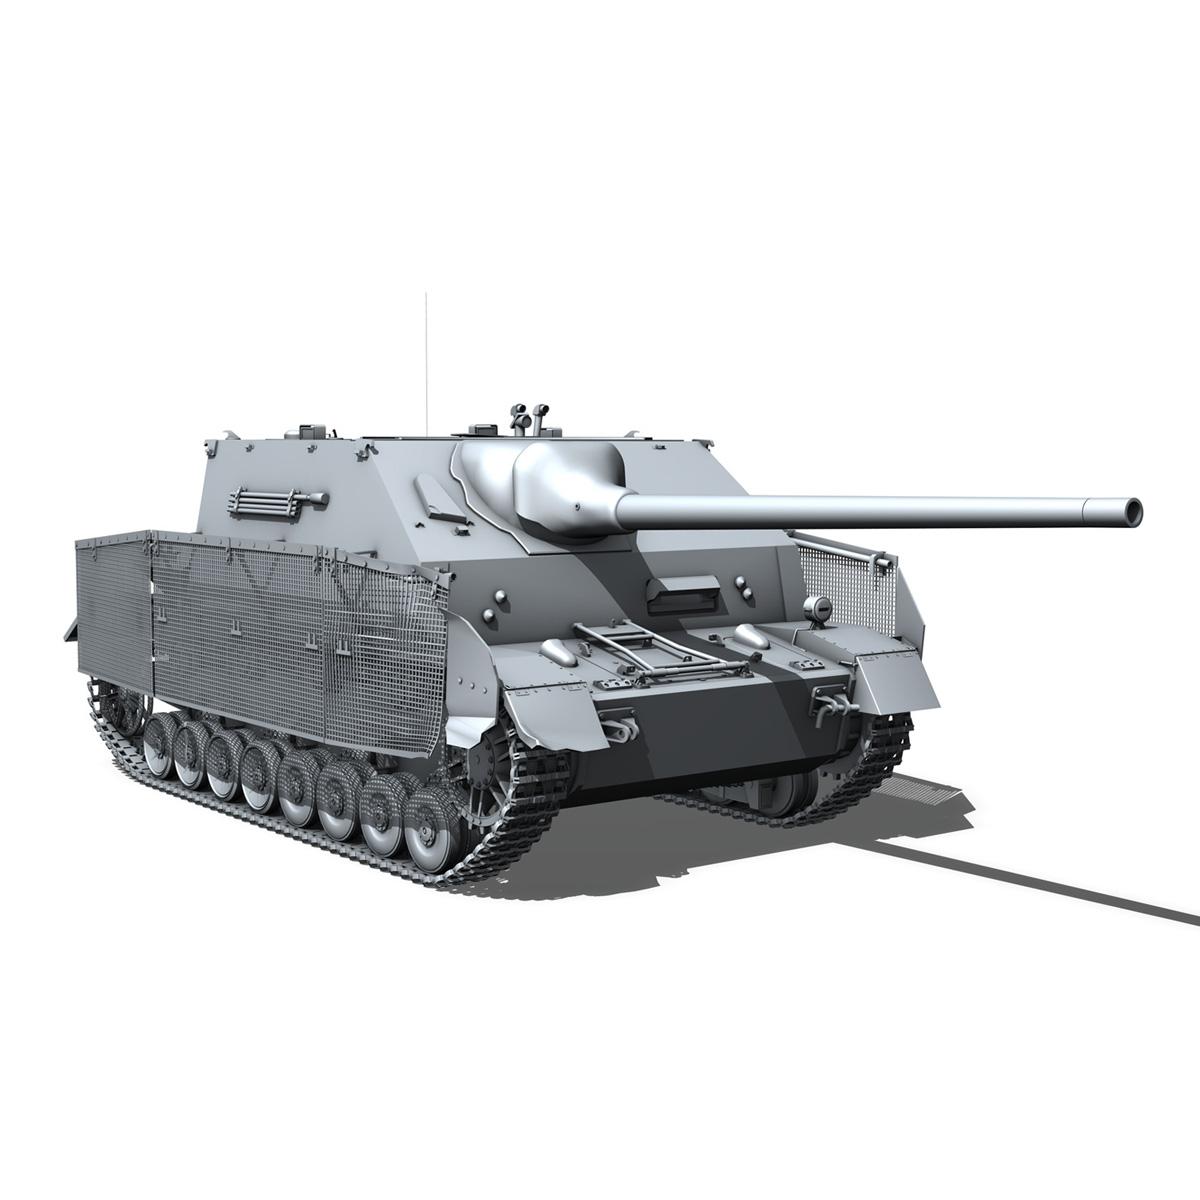 jagdpanzer iv l/70 (a) – sd.kfz 162/1 3d model 3ds fbx c4d lwo obj 202013